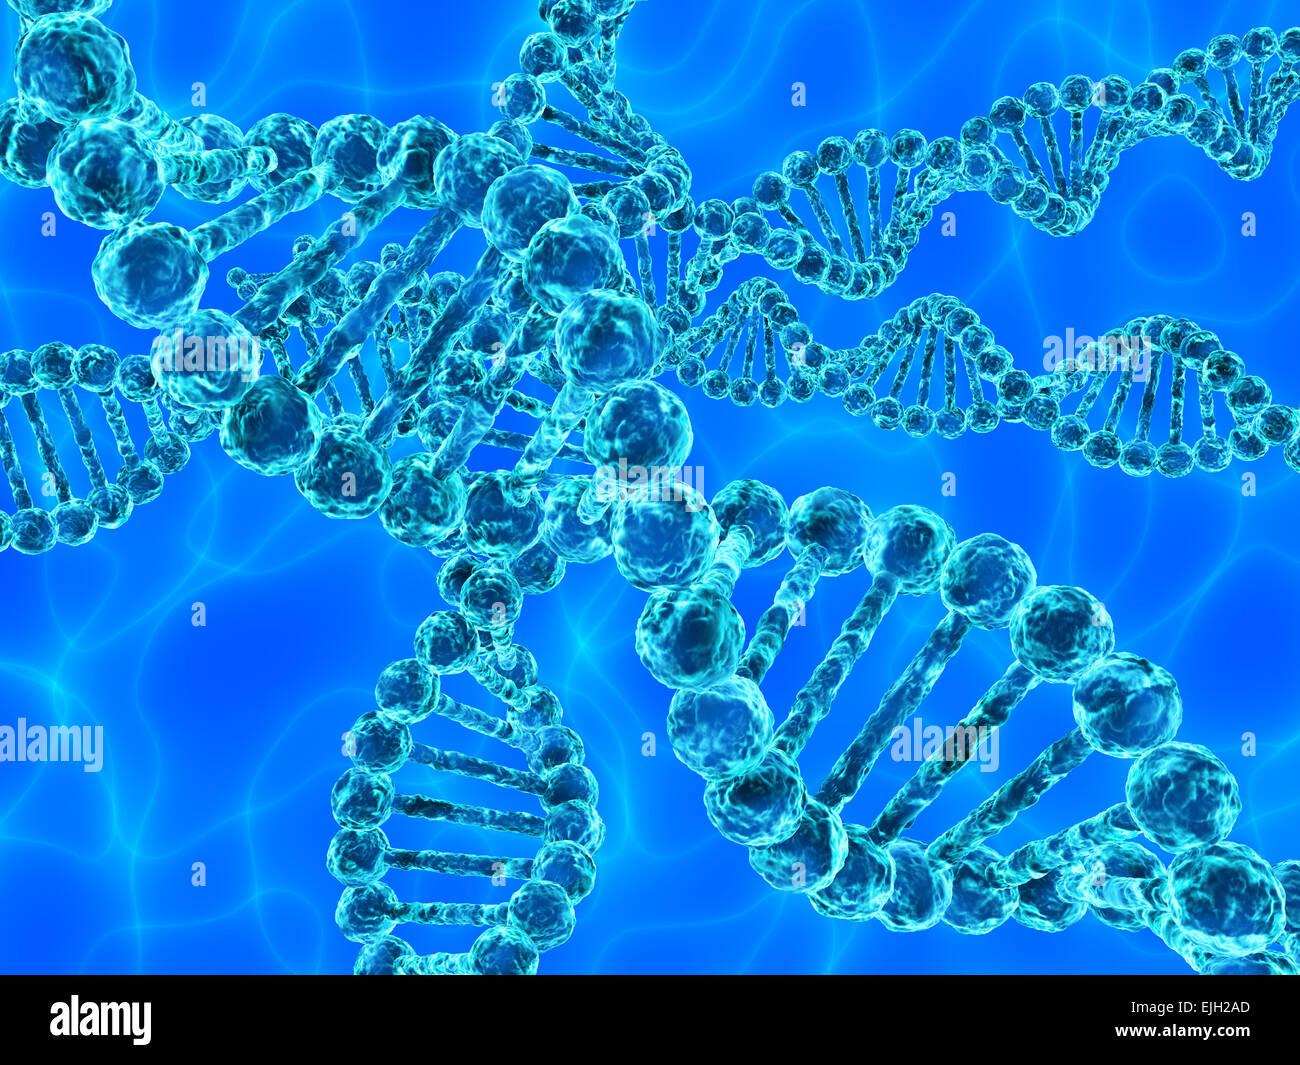 Illustration of blue DNA (deoxyribonucleic acid) - Stock Image